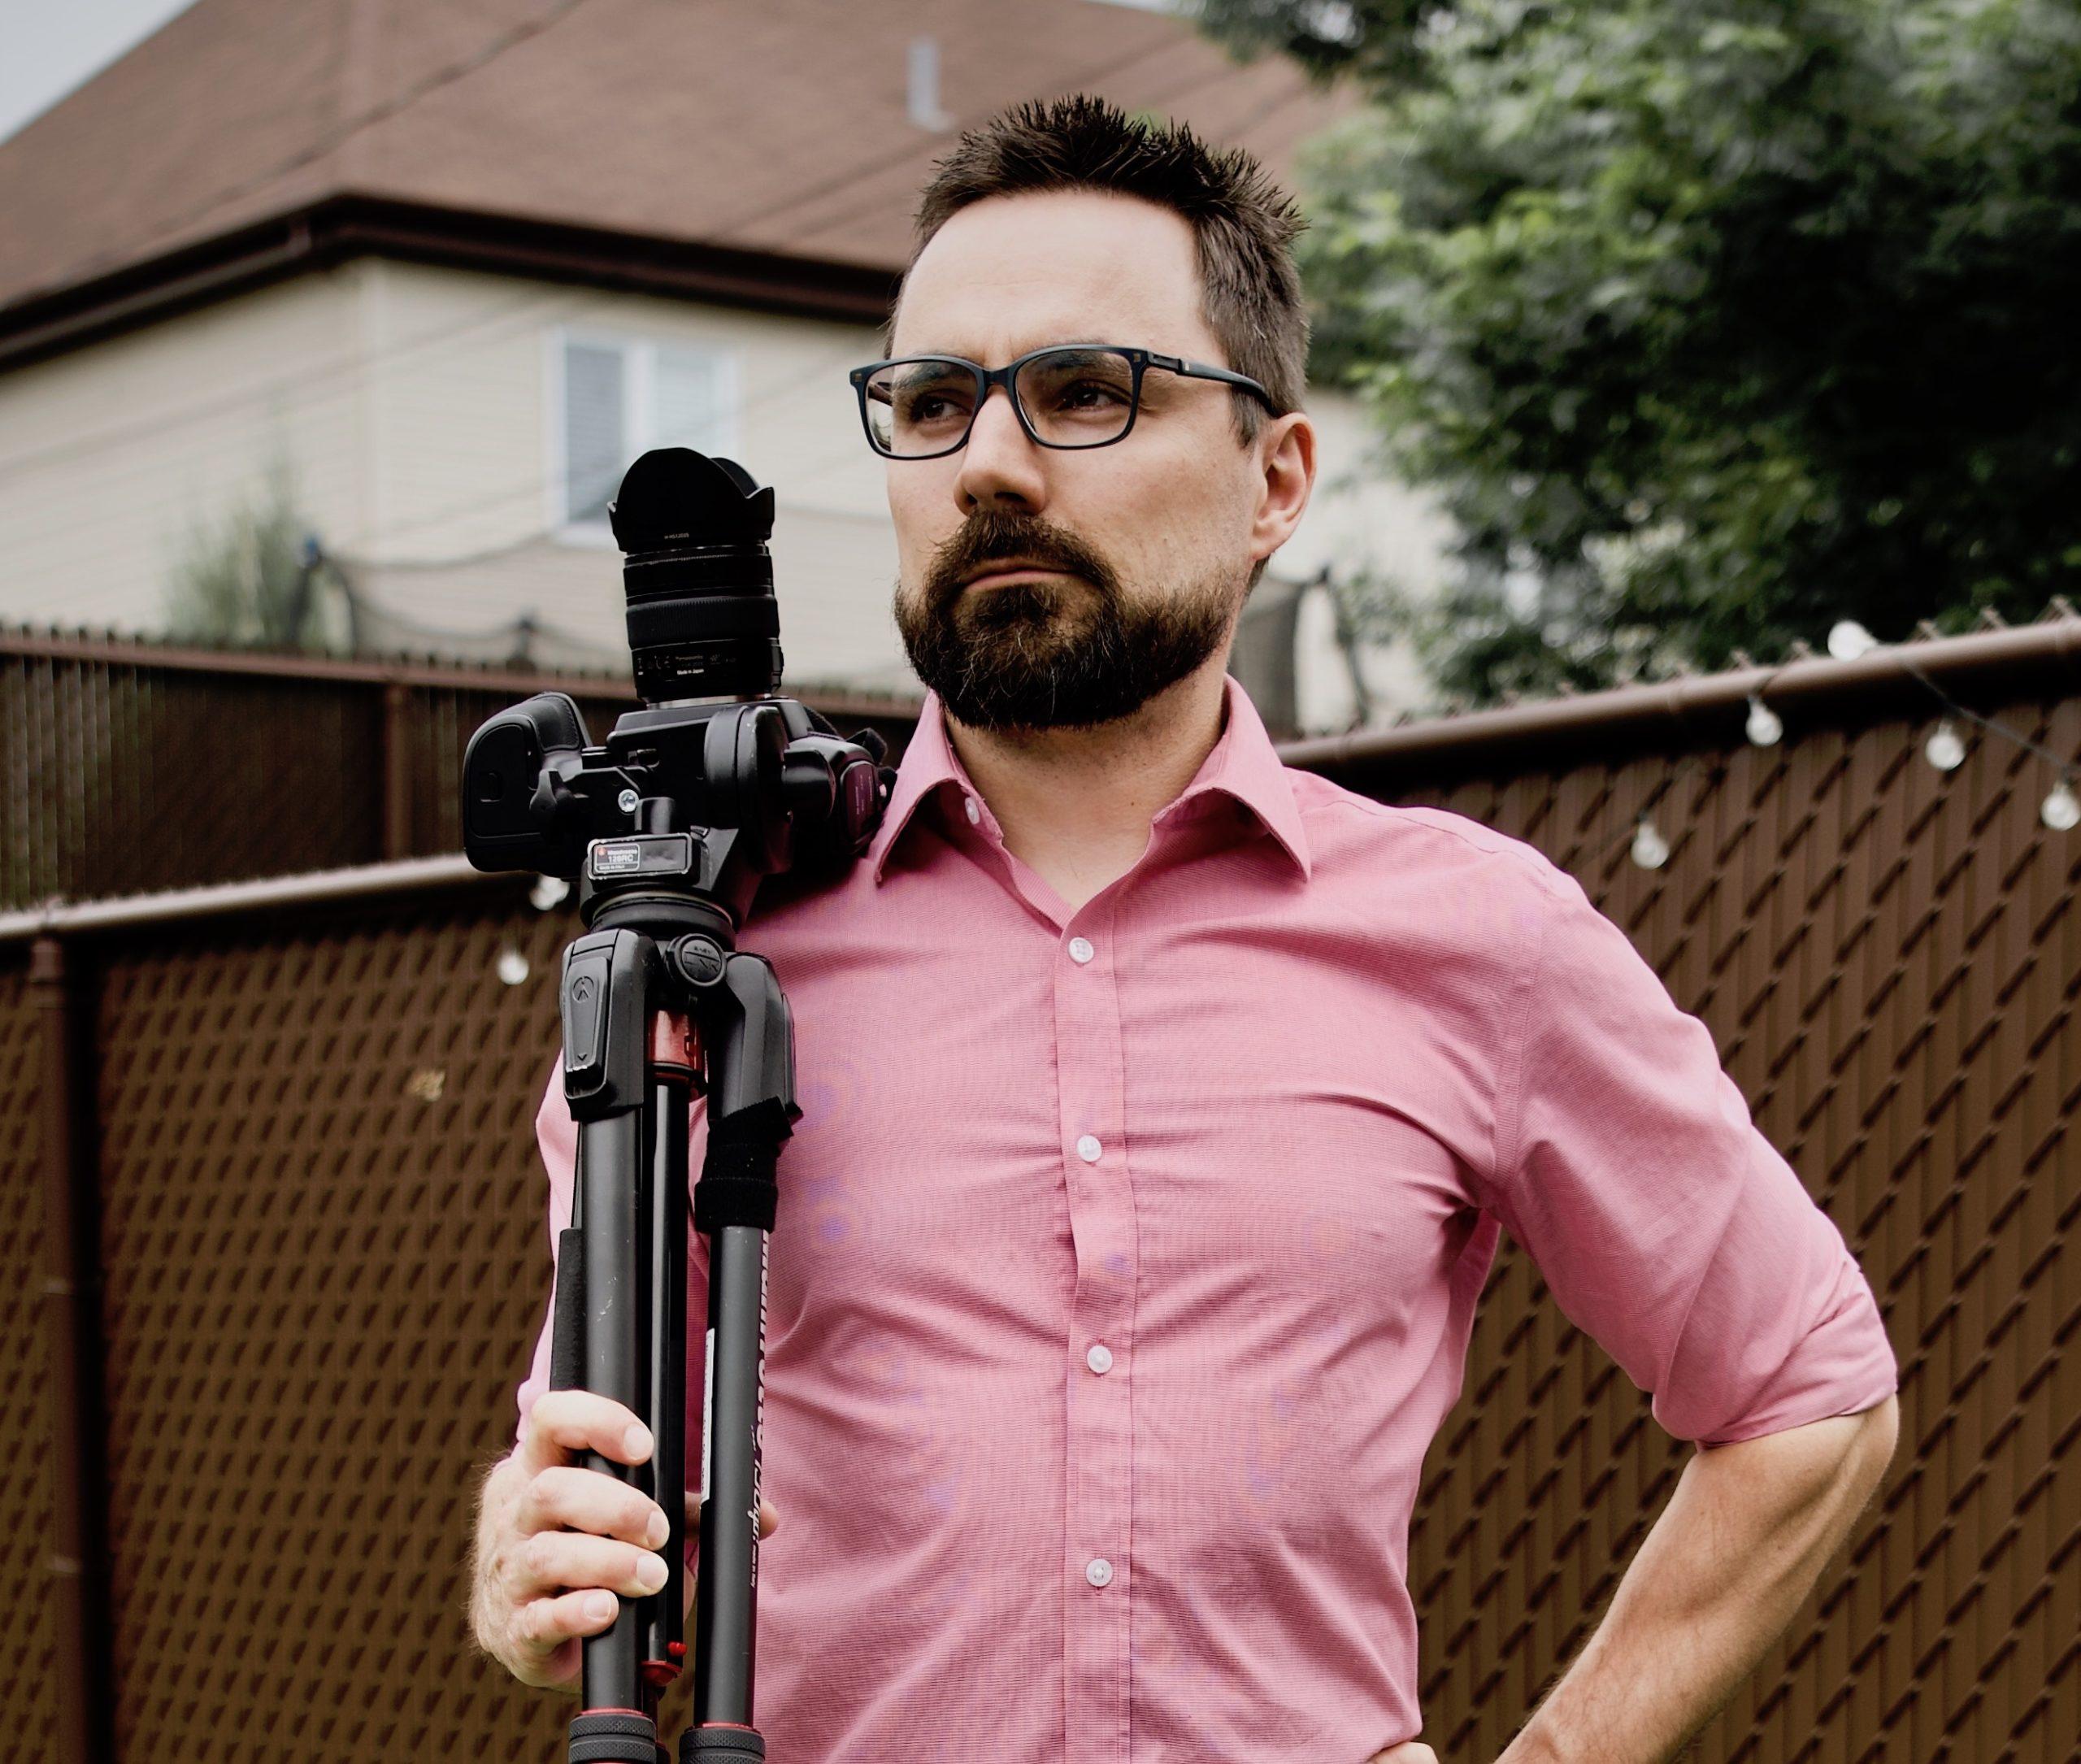 Noah holding a camera